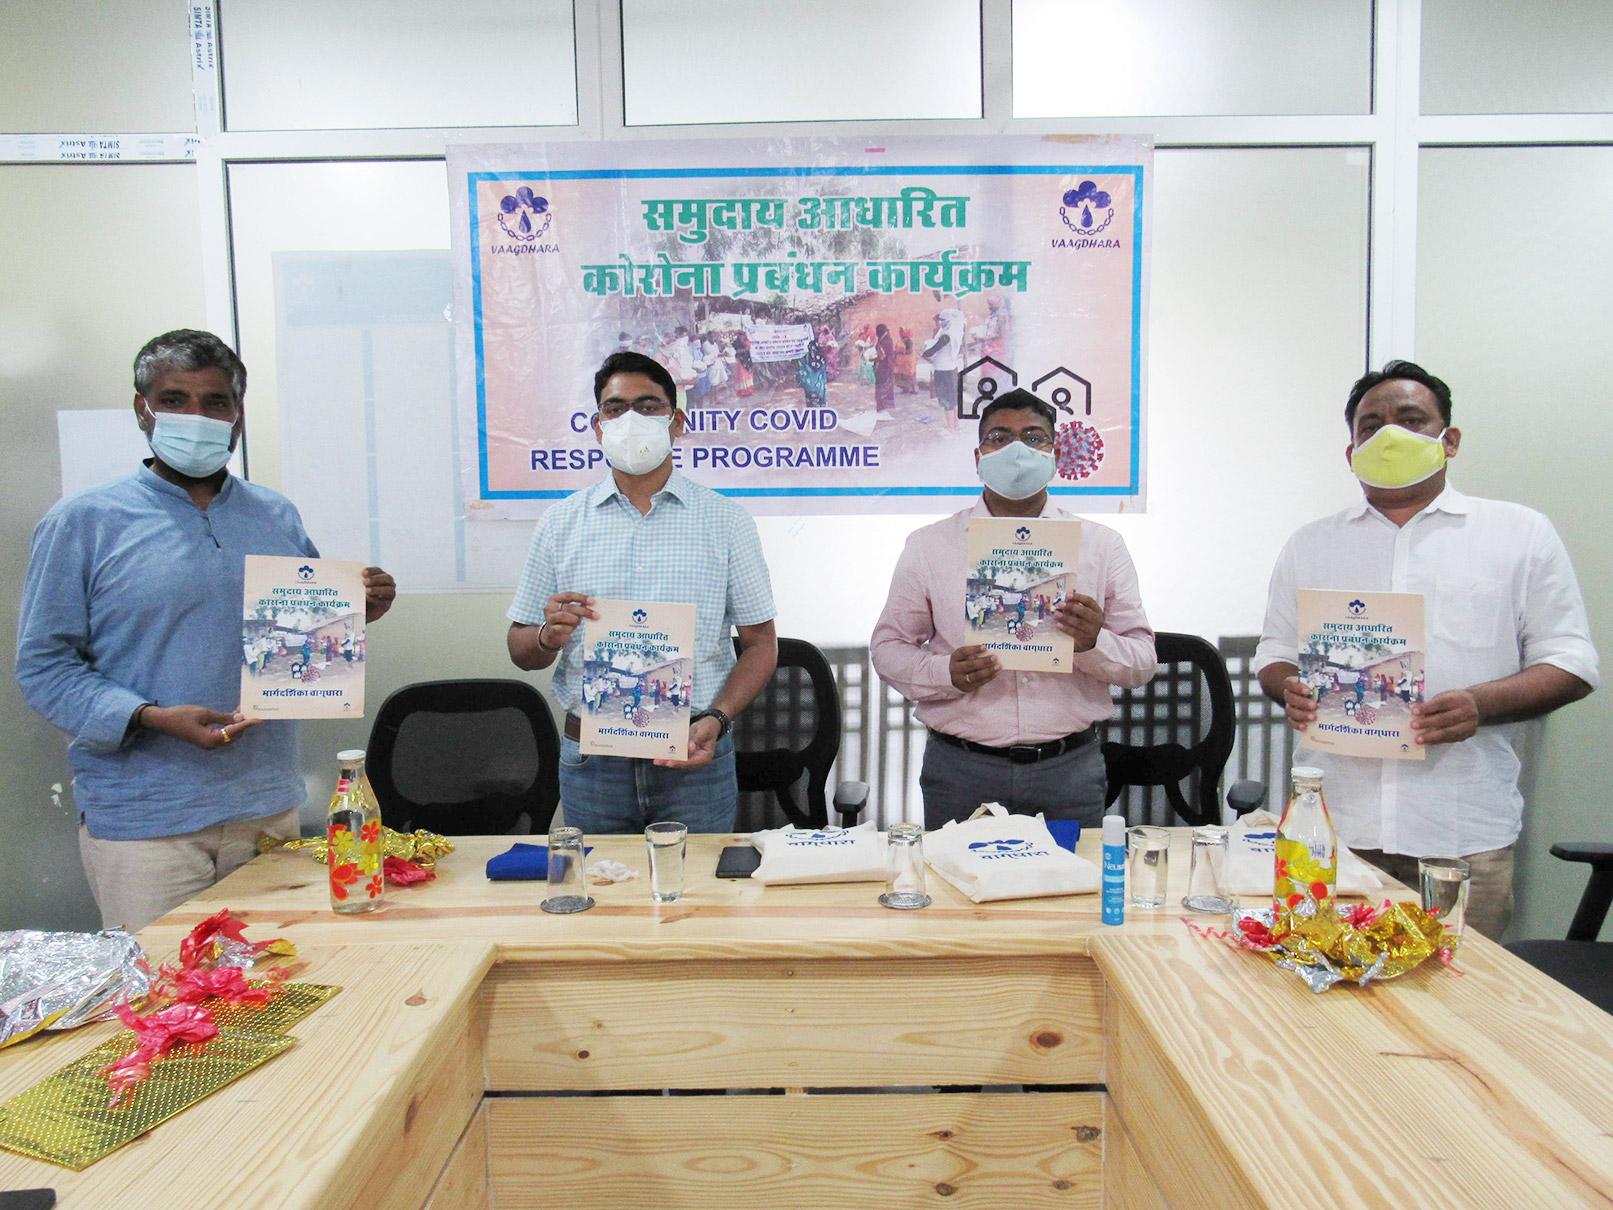 vaagdhara-ambulance-service-for-community-8